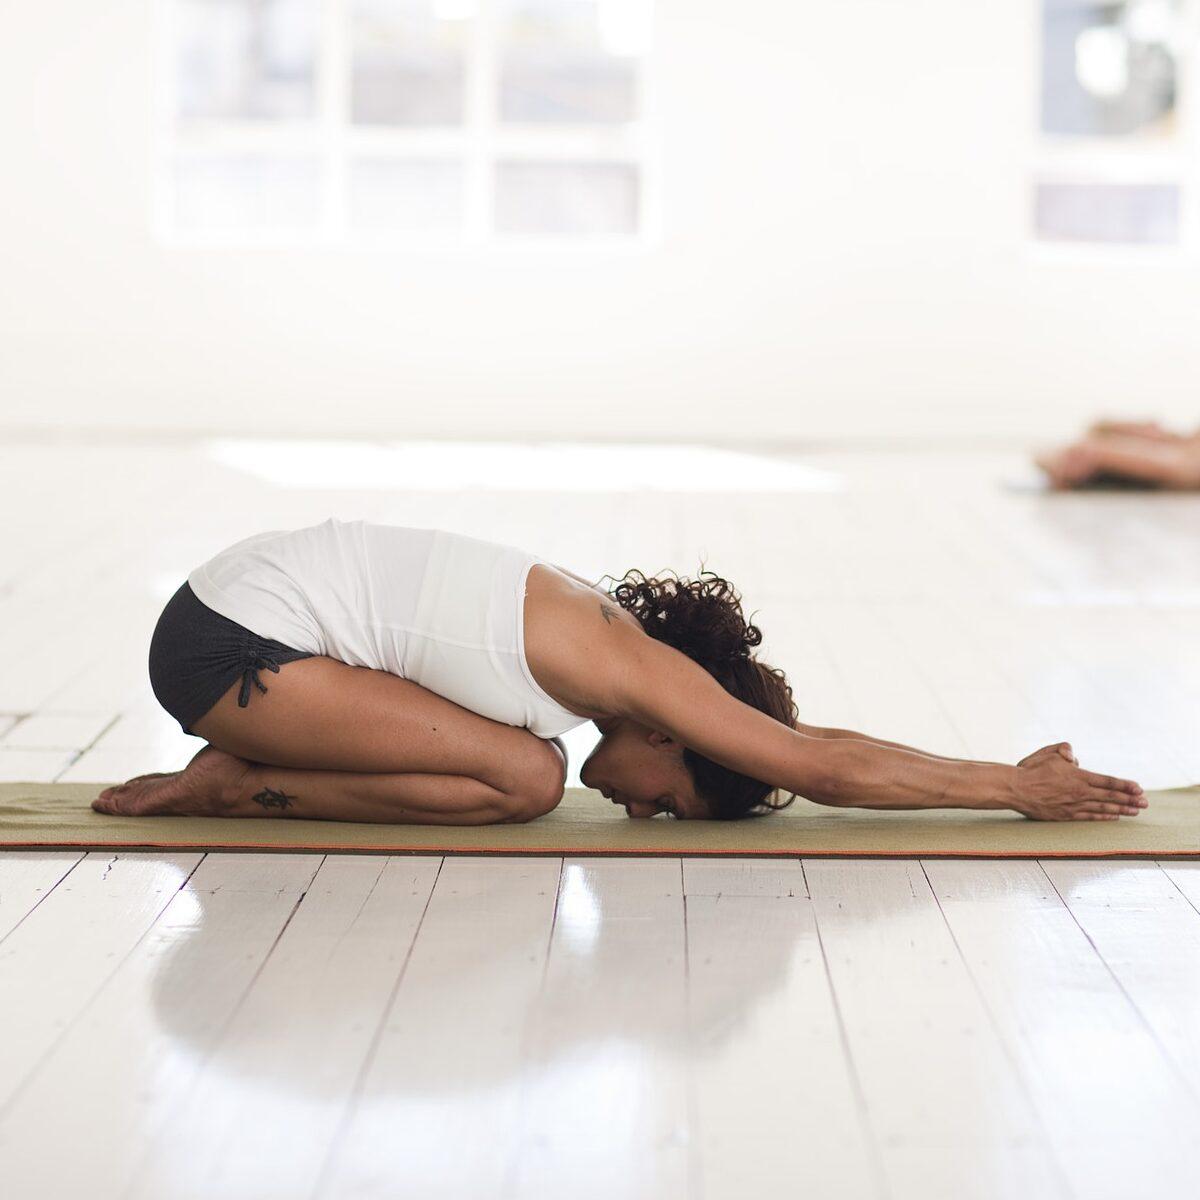 XOJON 居家瑜伽